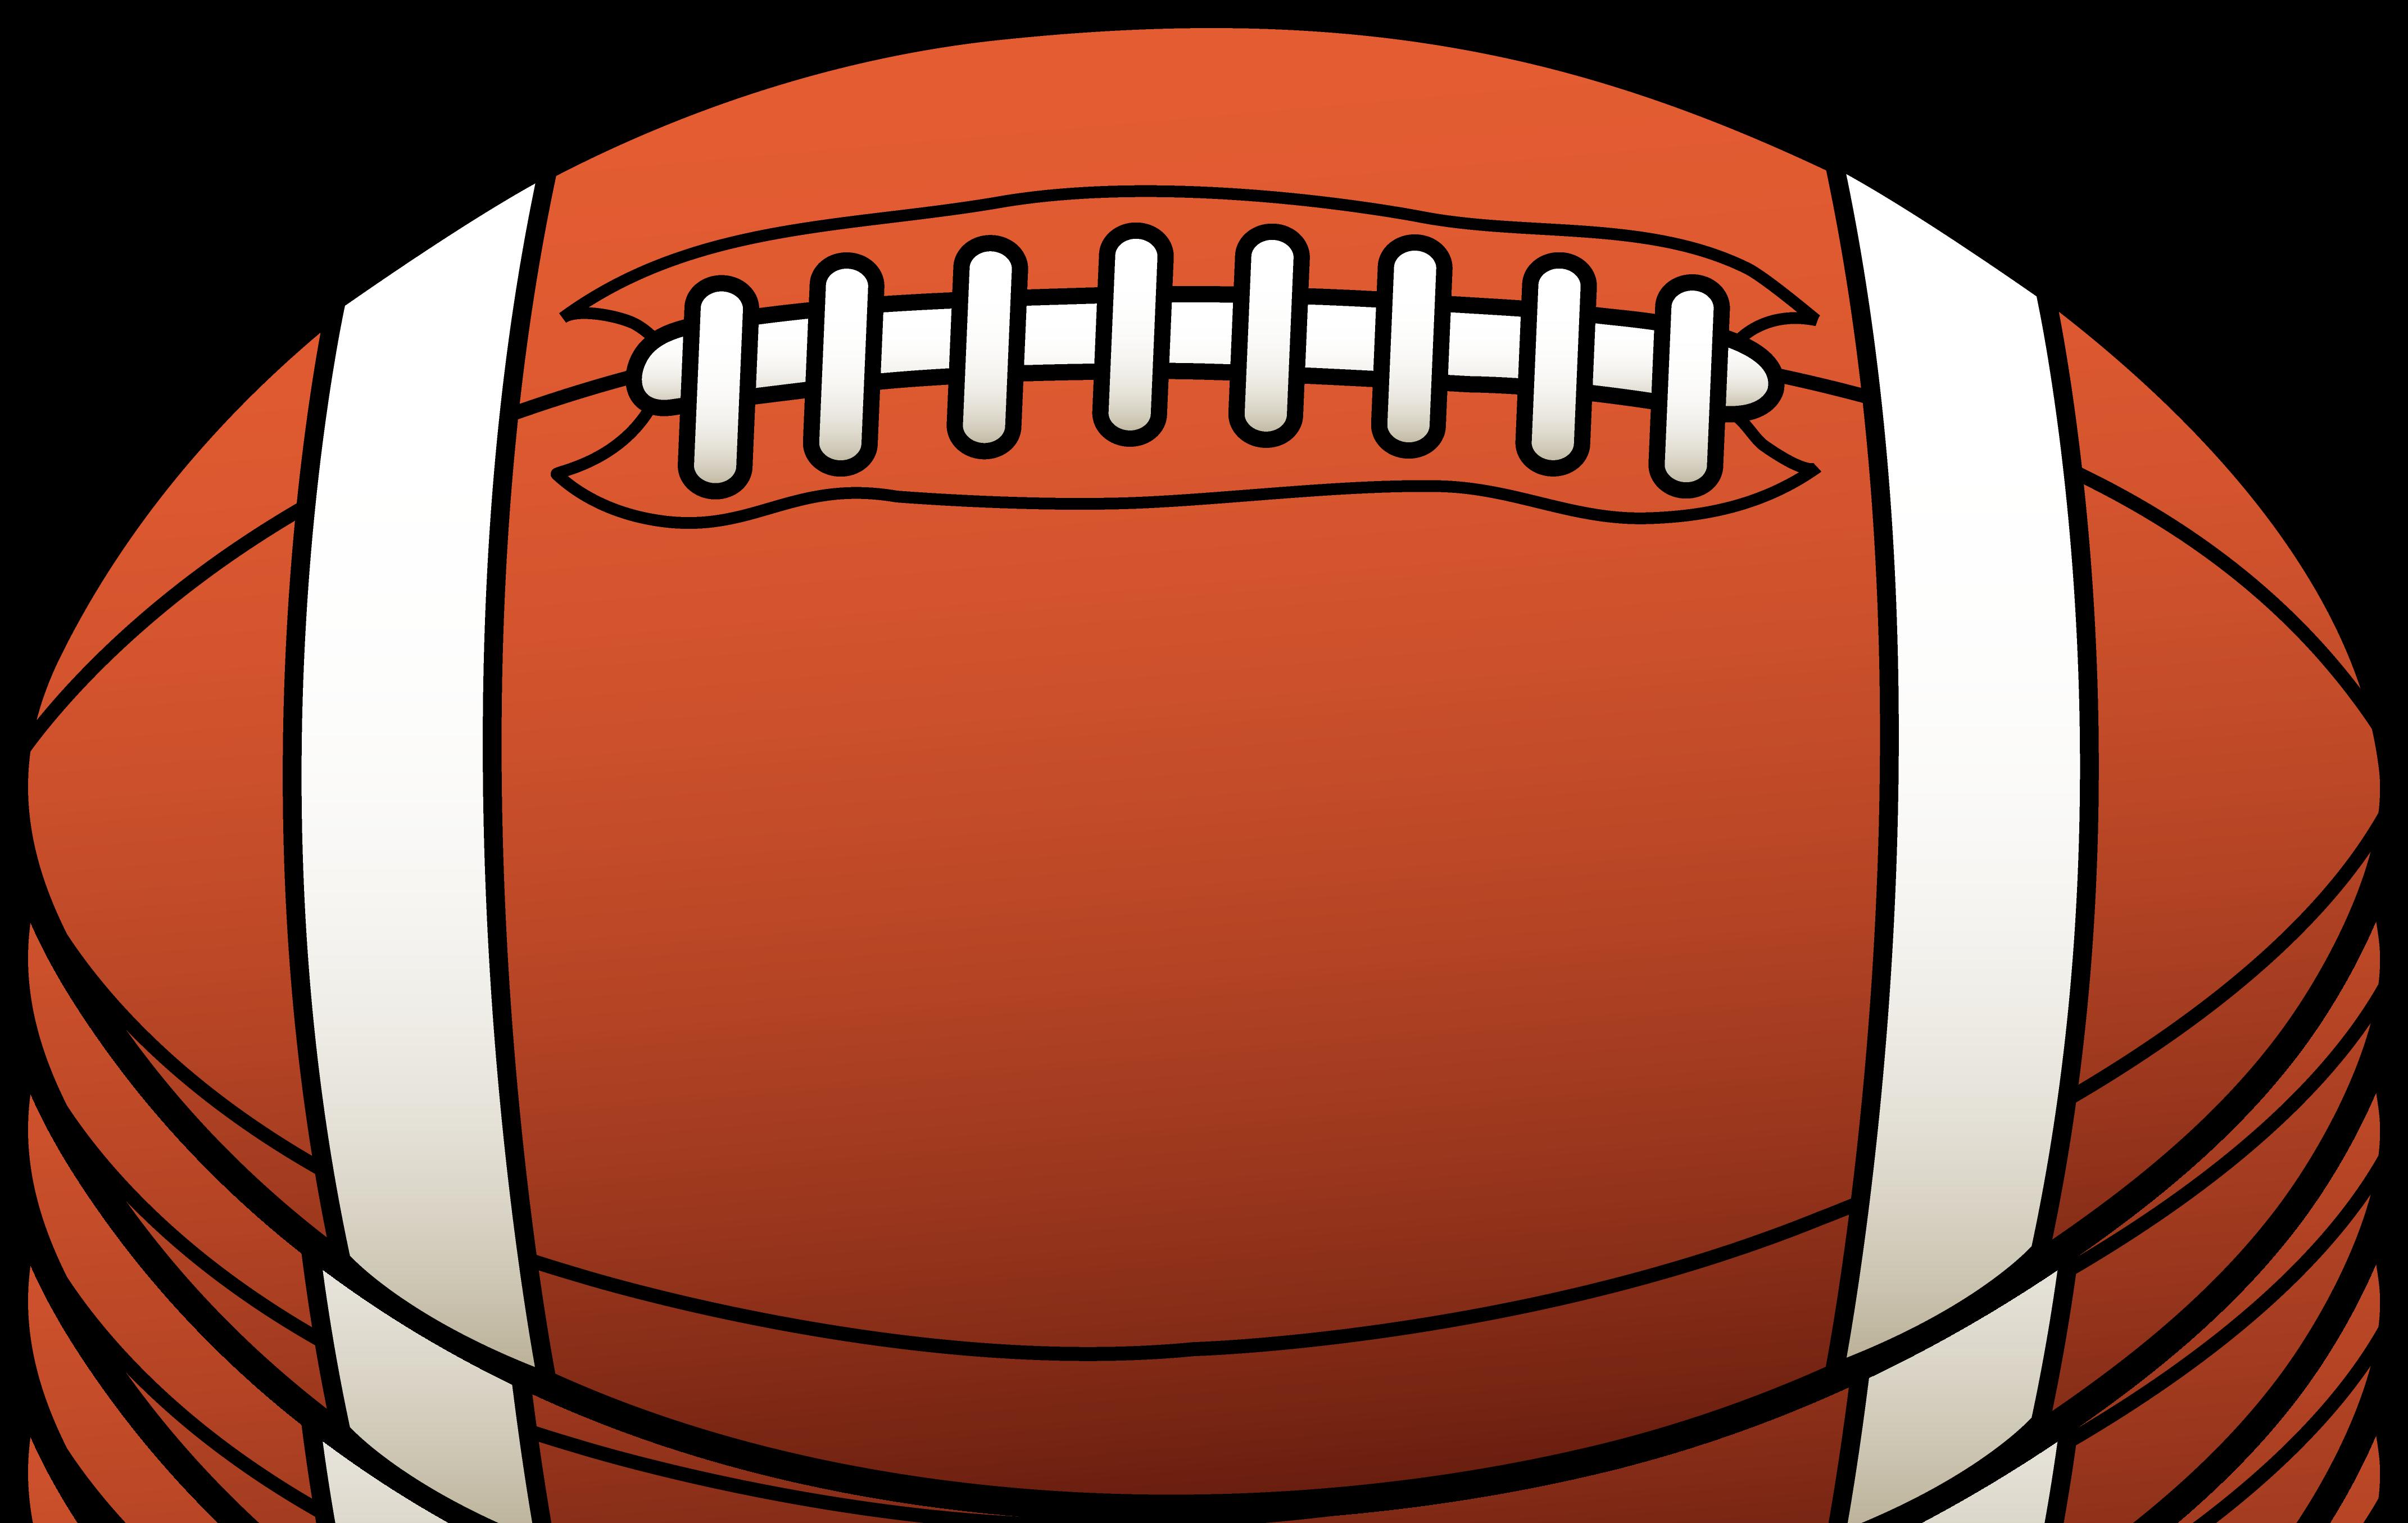 clipart football clipart panda sports football in 2018 rh pinterest com clip art football field clip art football ball